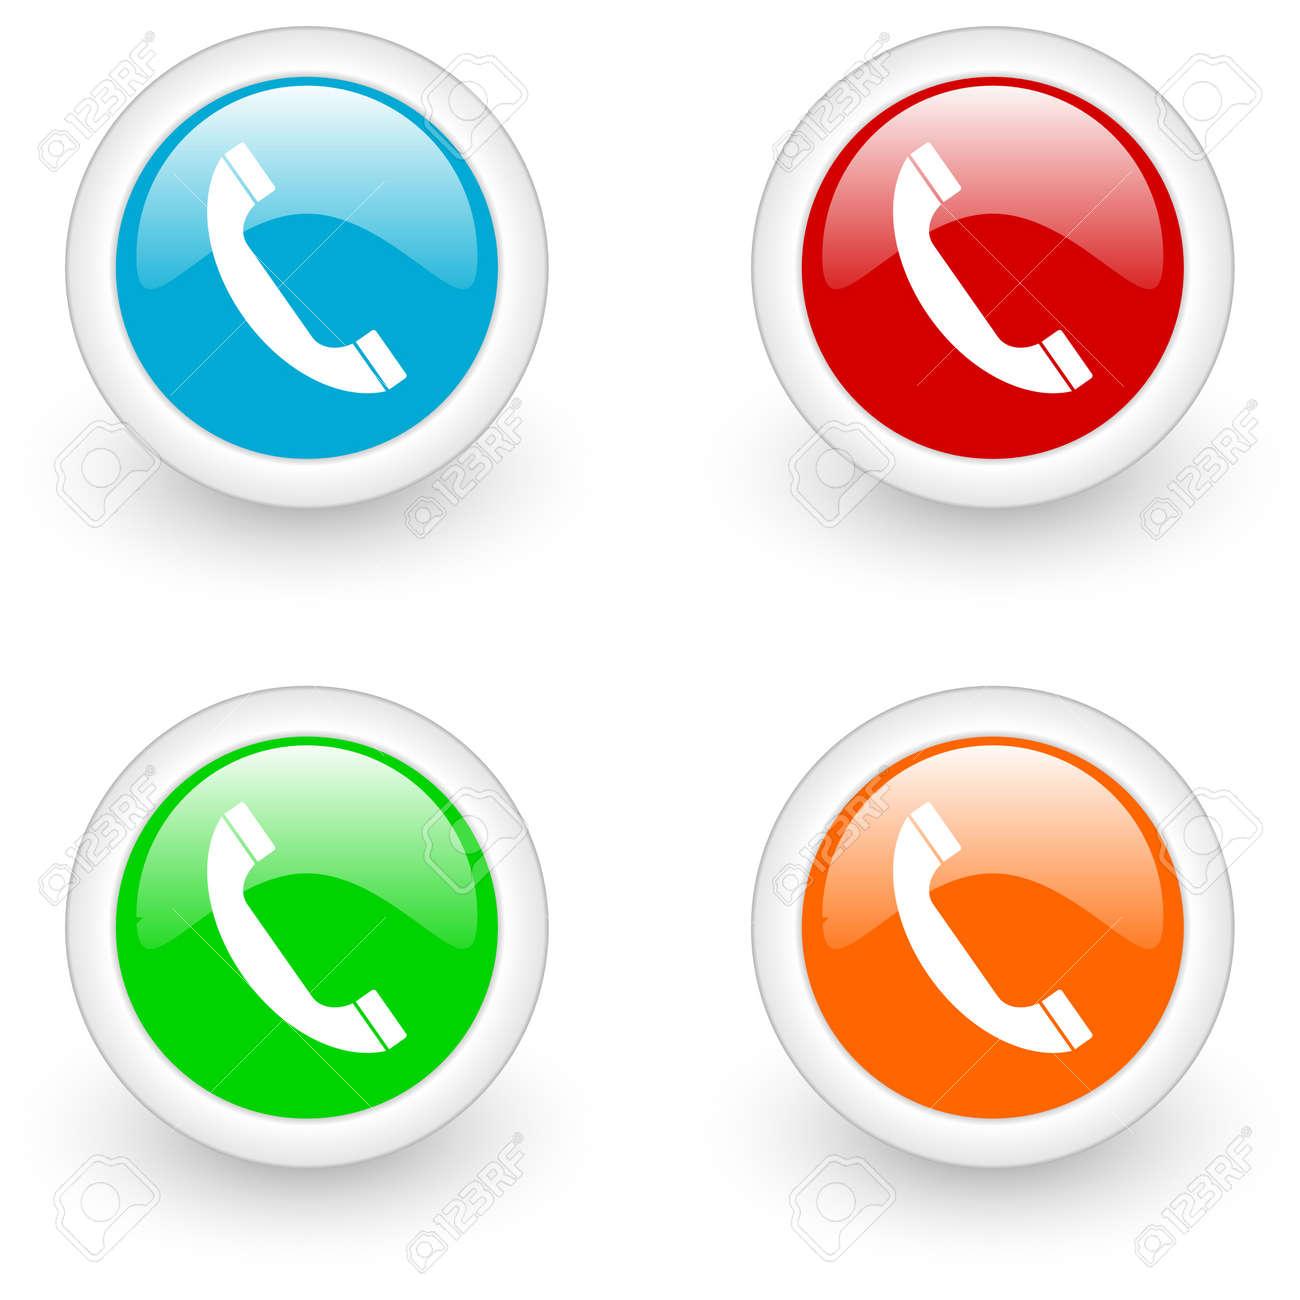 phone glossy icon Stock Photo - 12013282